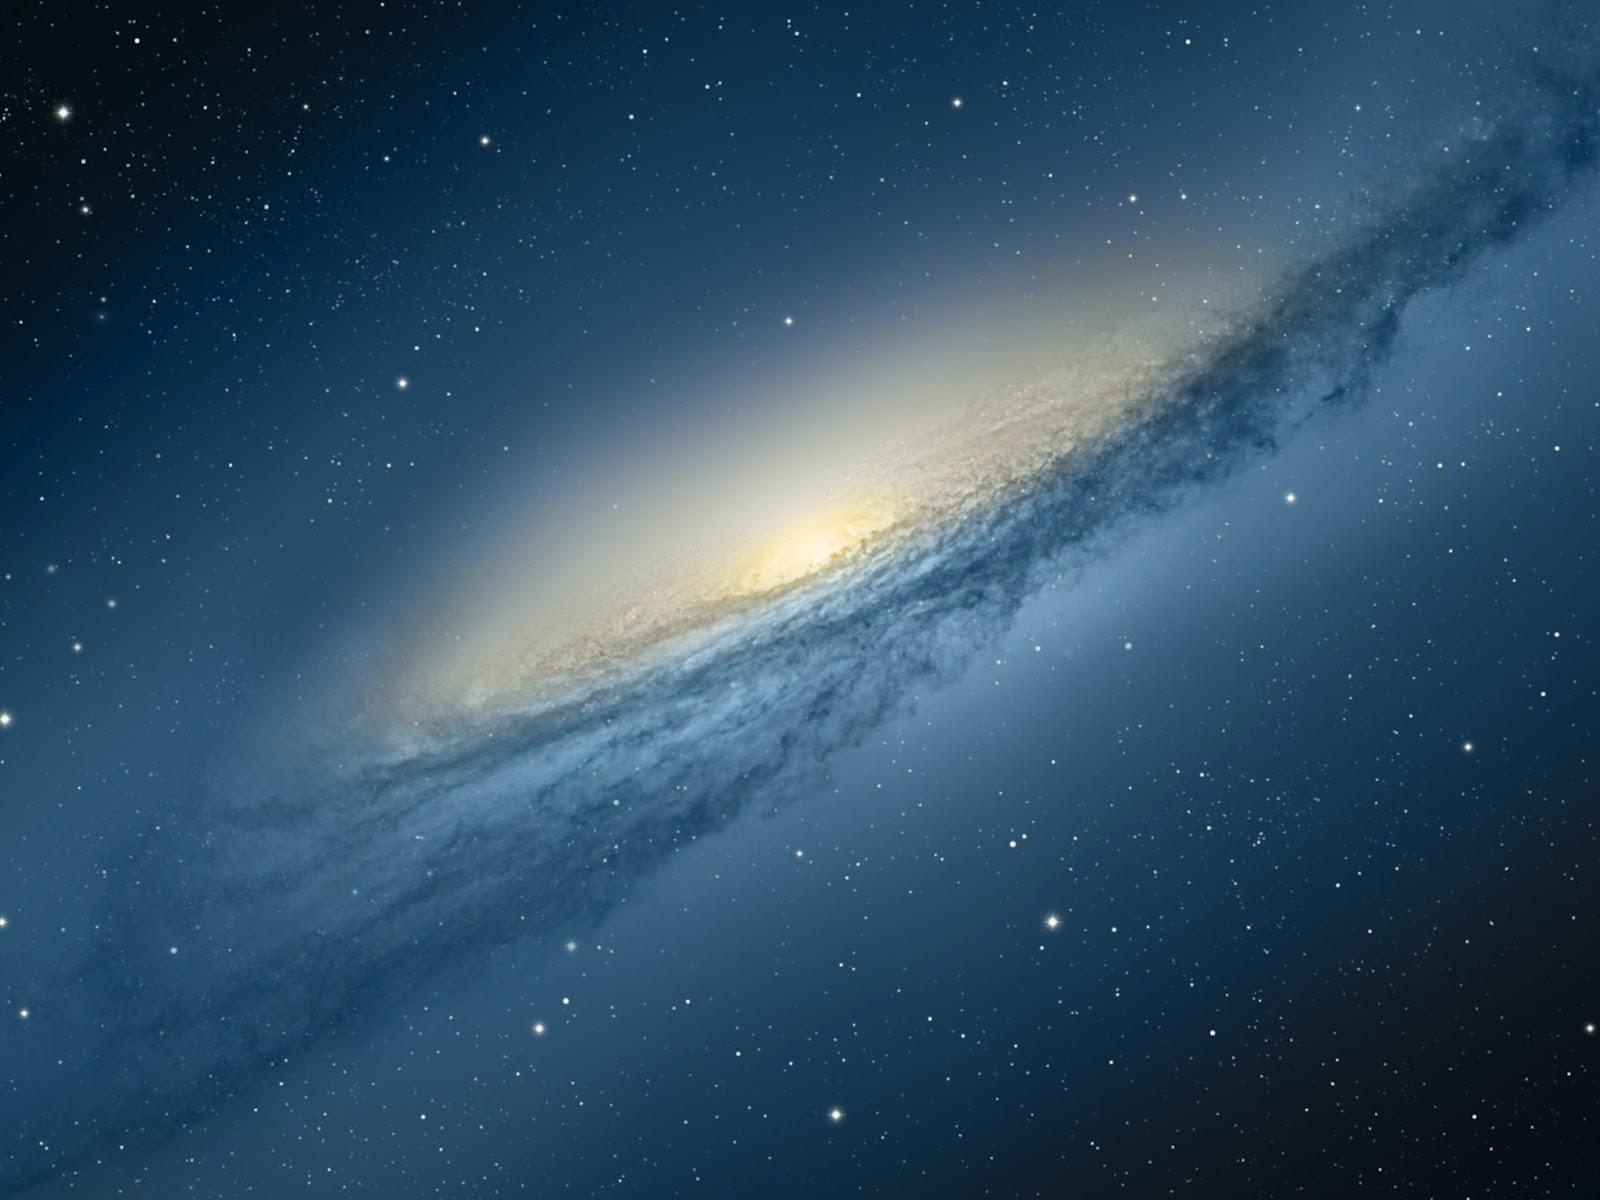 Wallpaper For Galaxy Tab: Wallpaper: Wallpaper Samsung Galaxy S1